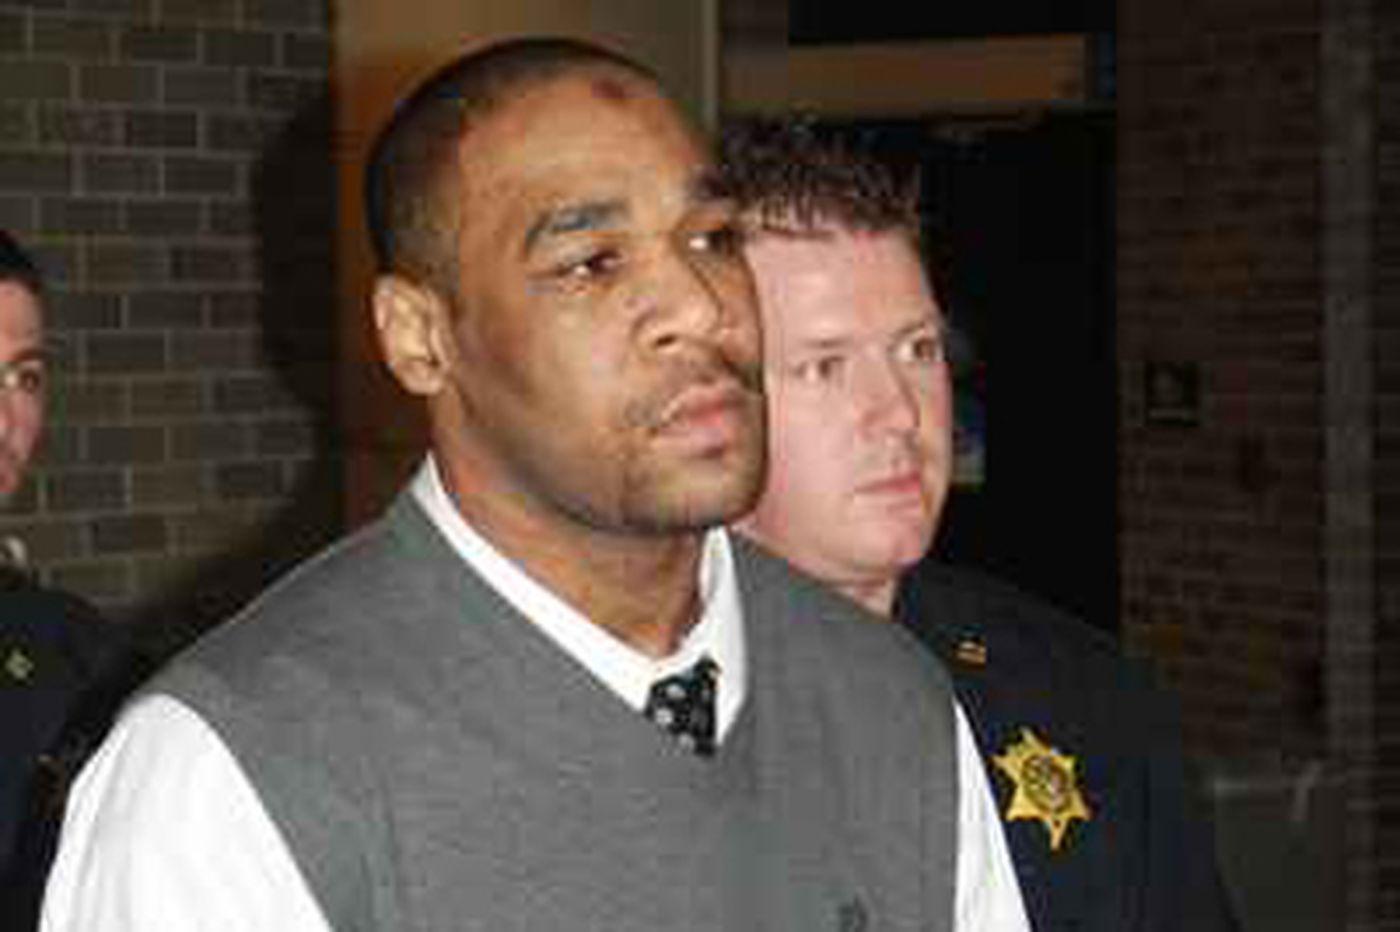 Bucks jury convicts Cash in carjacking, slaying